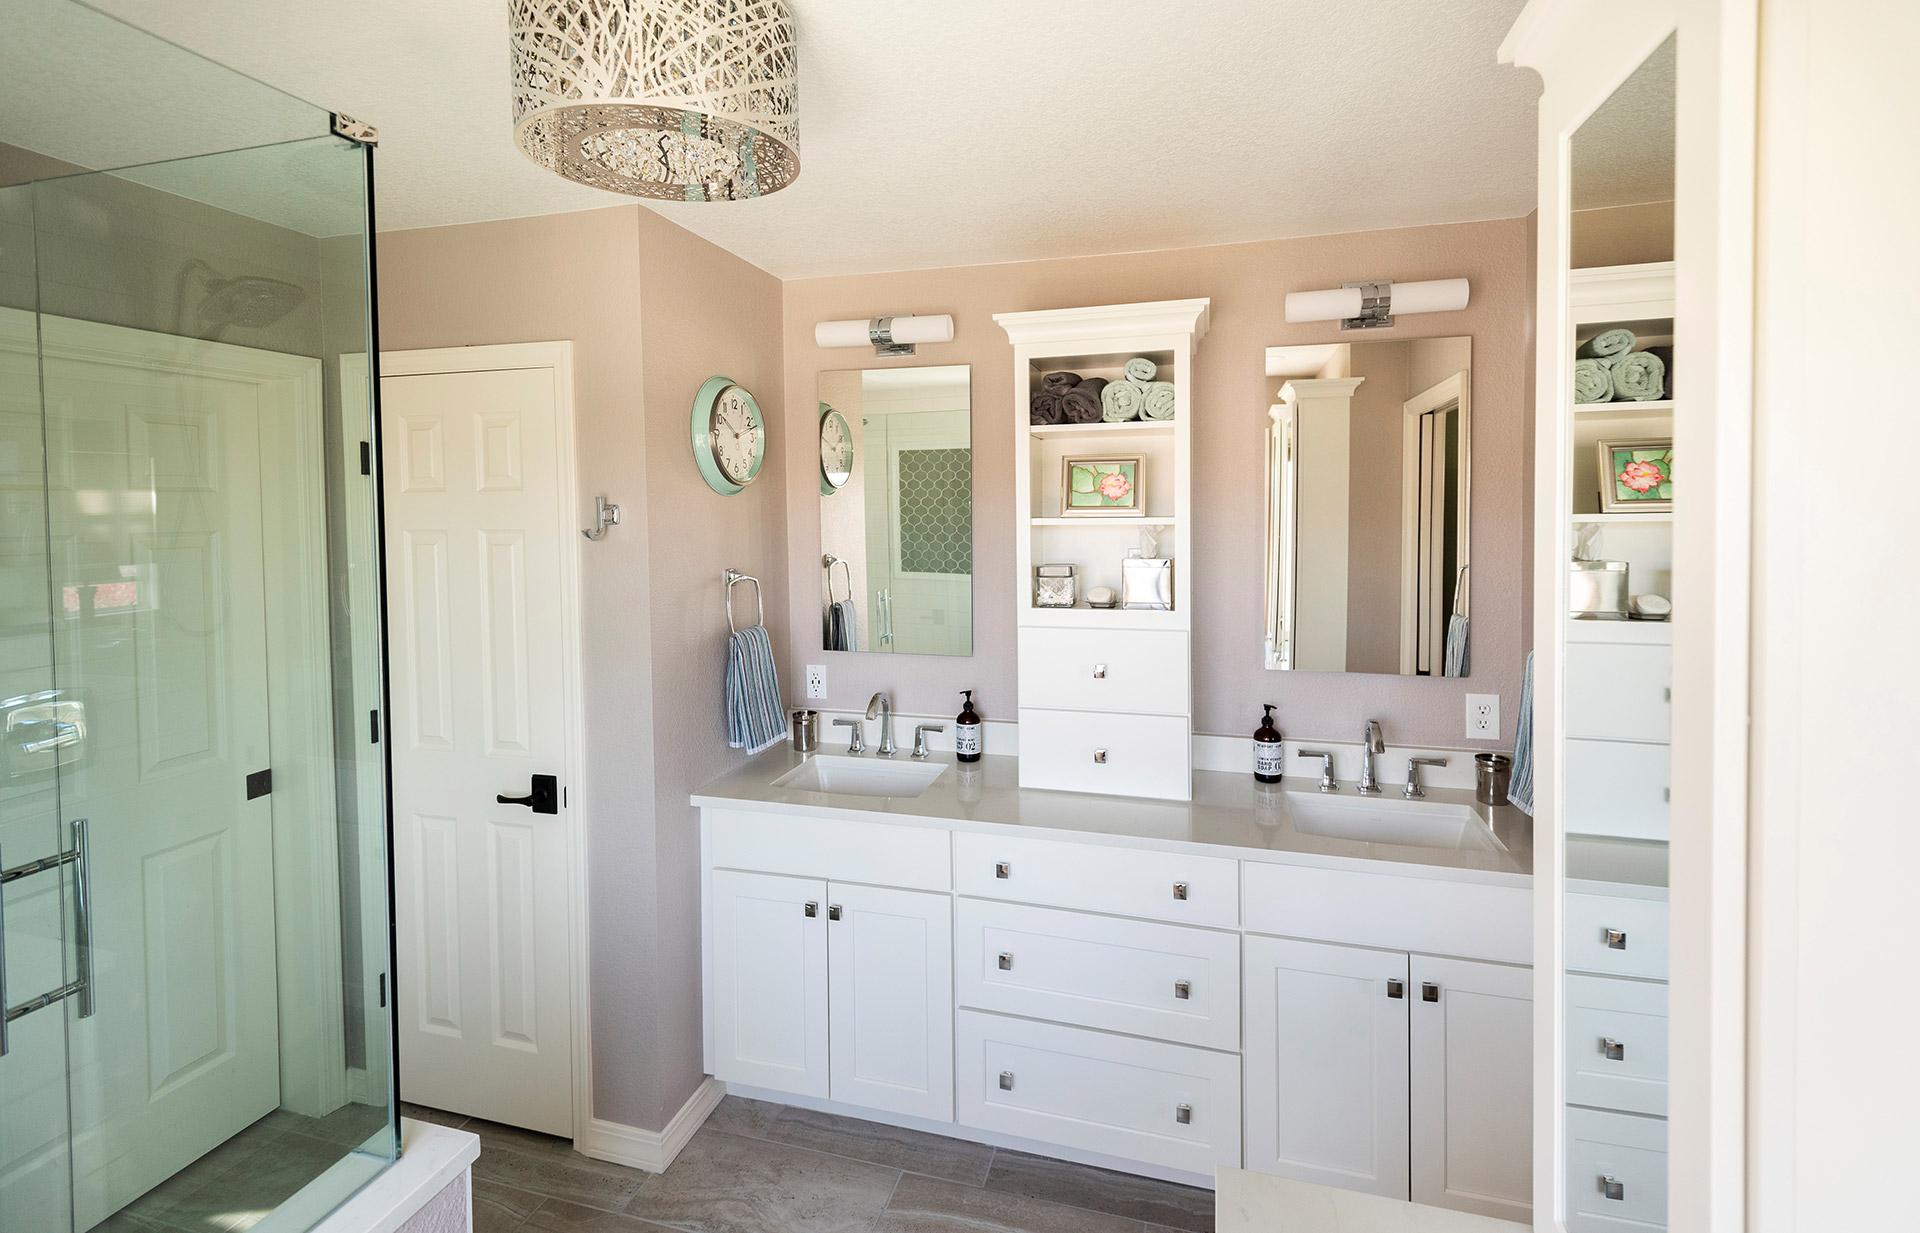 20190503_mccarty-bathroom-5-crop